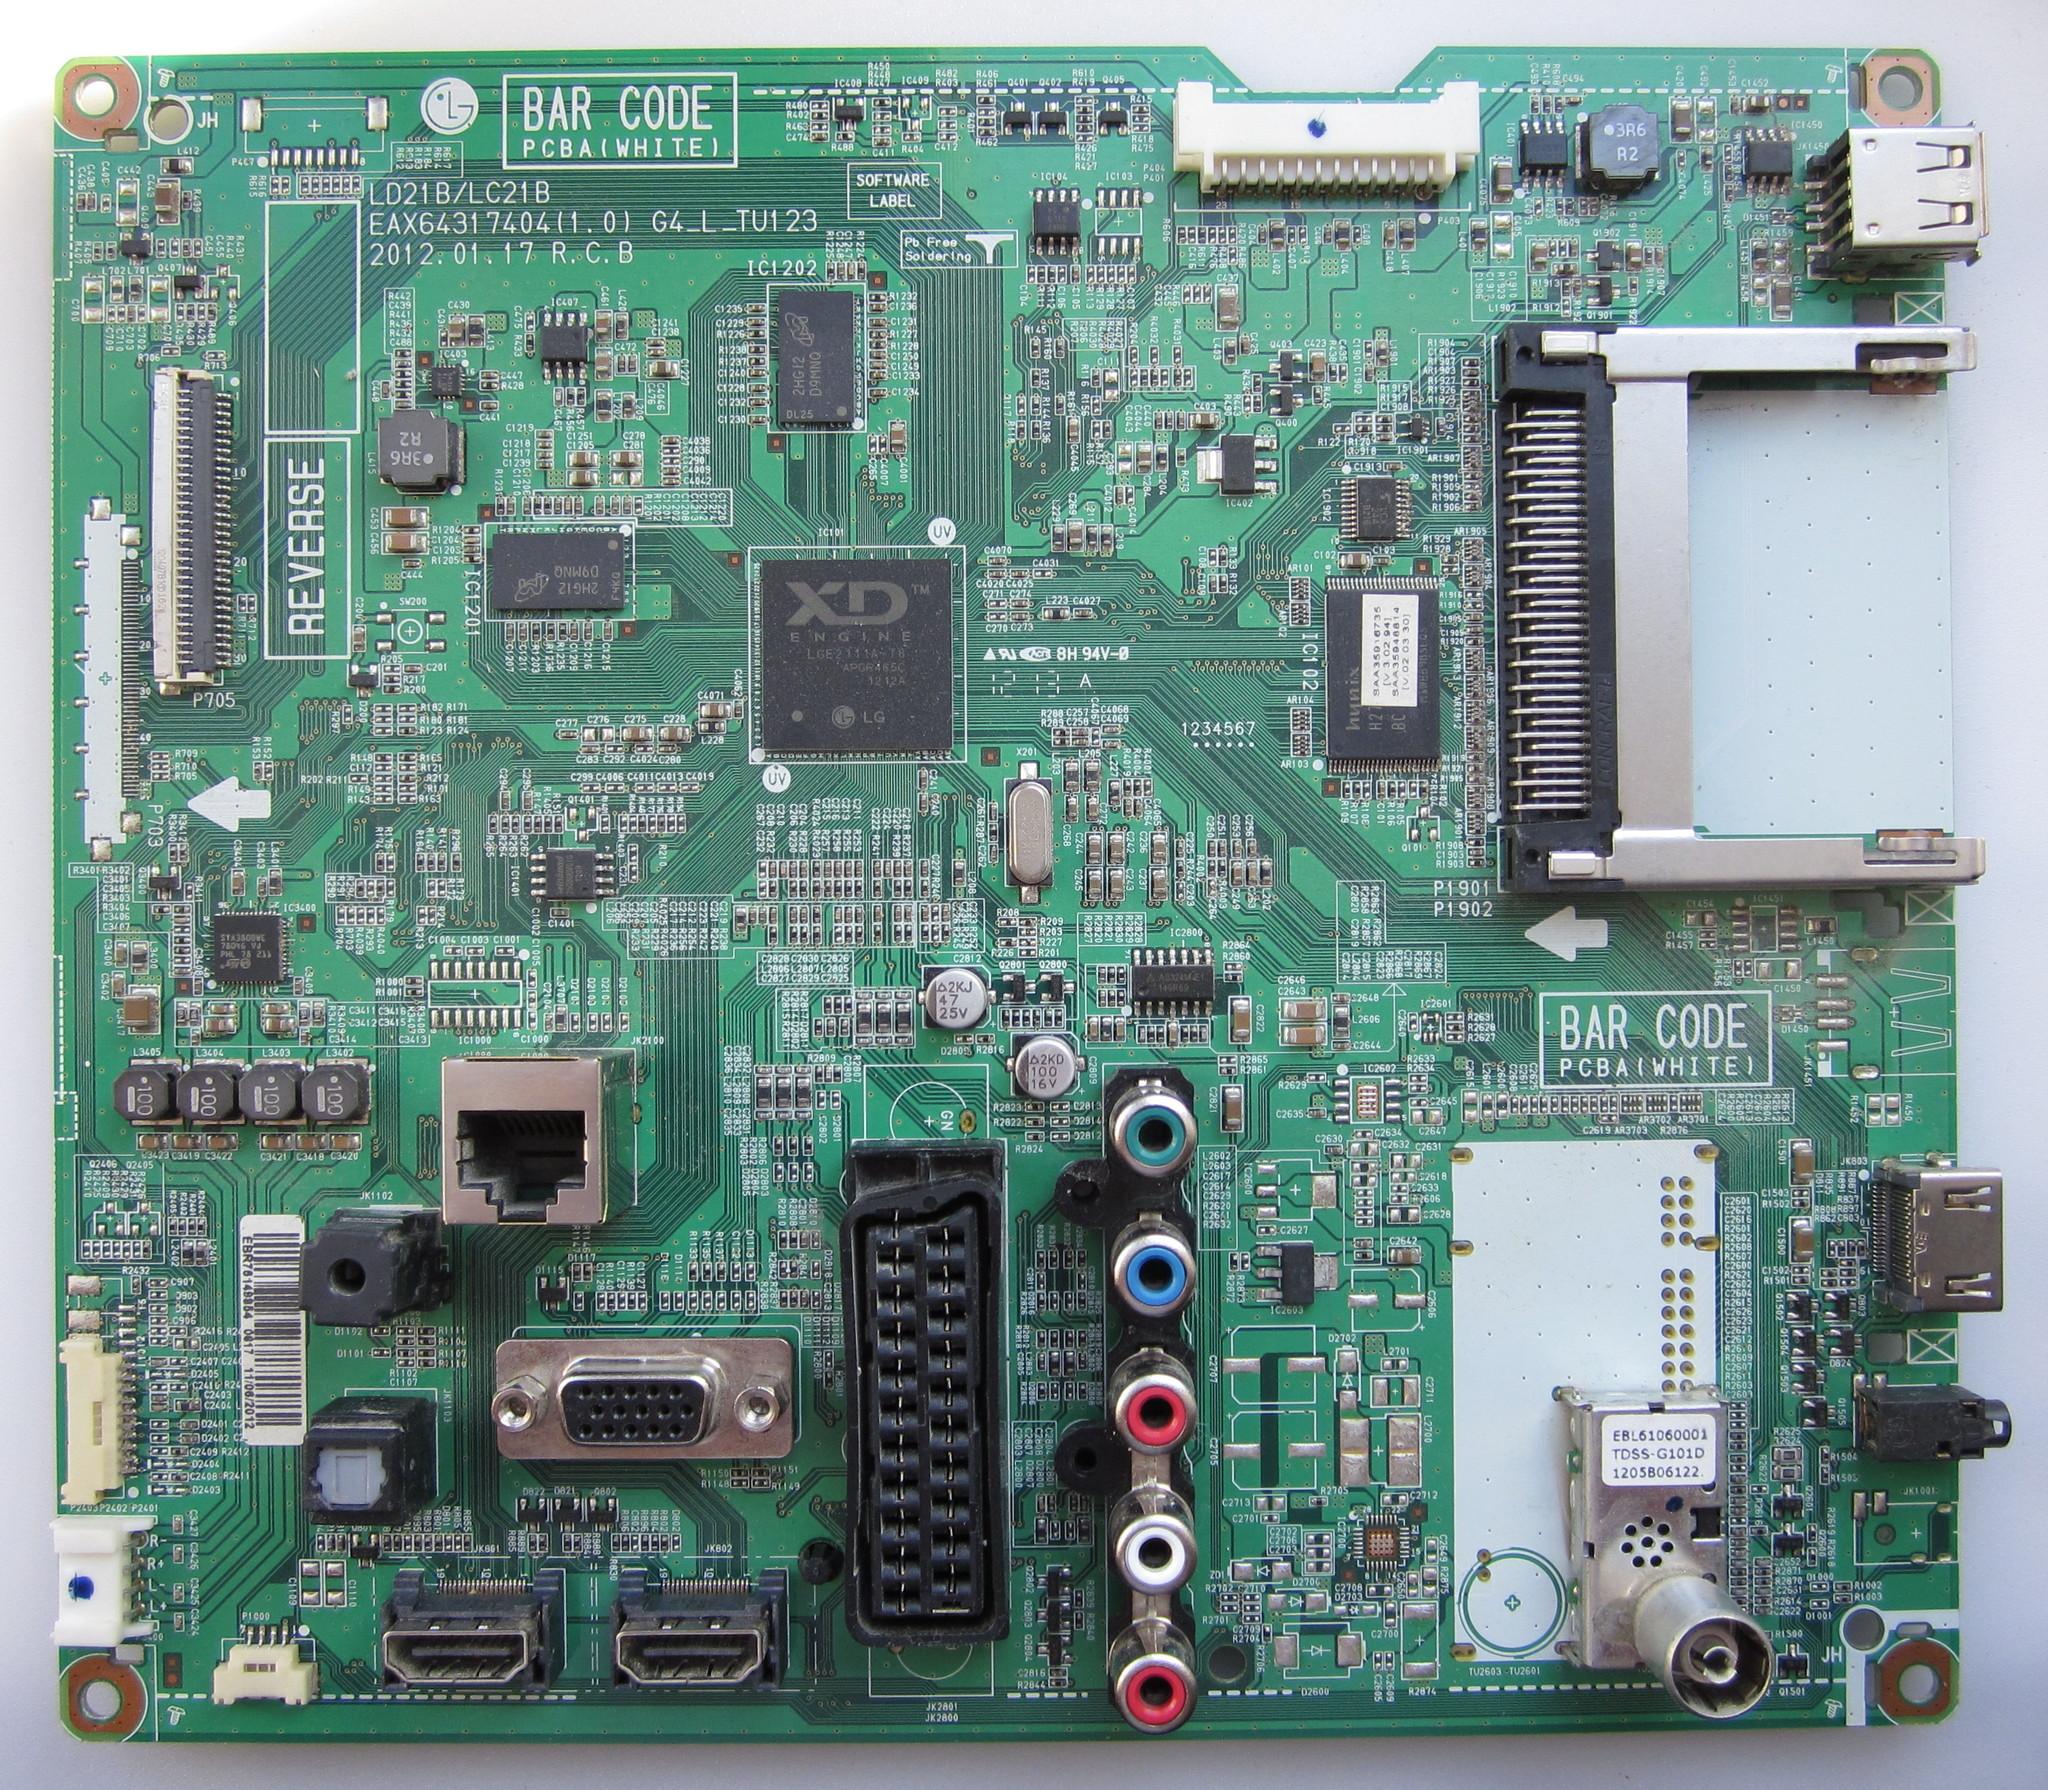 EAX64317404(1.0) EBR76149354